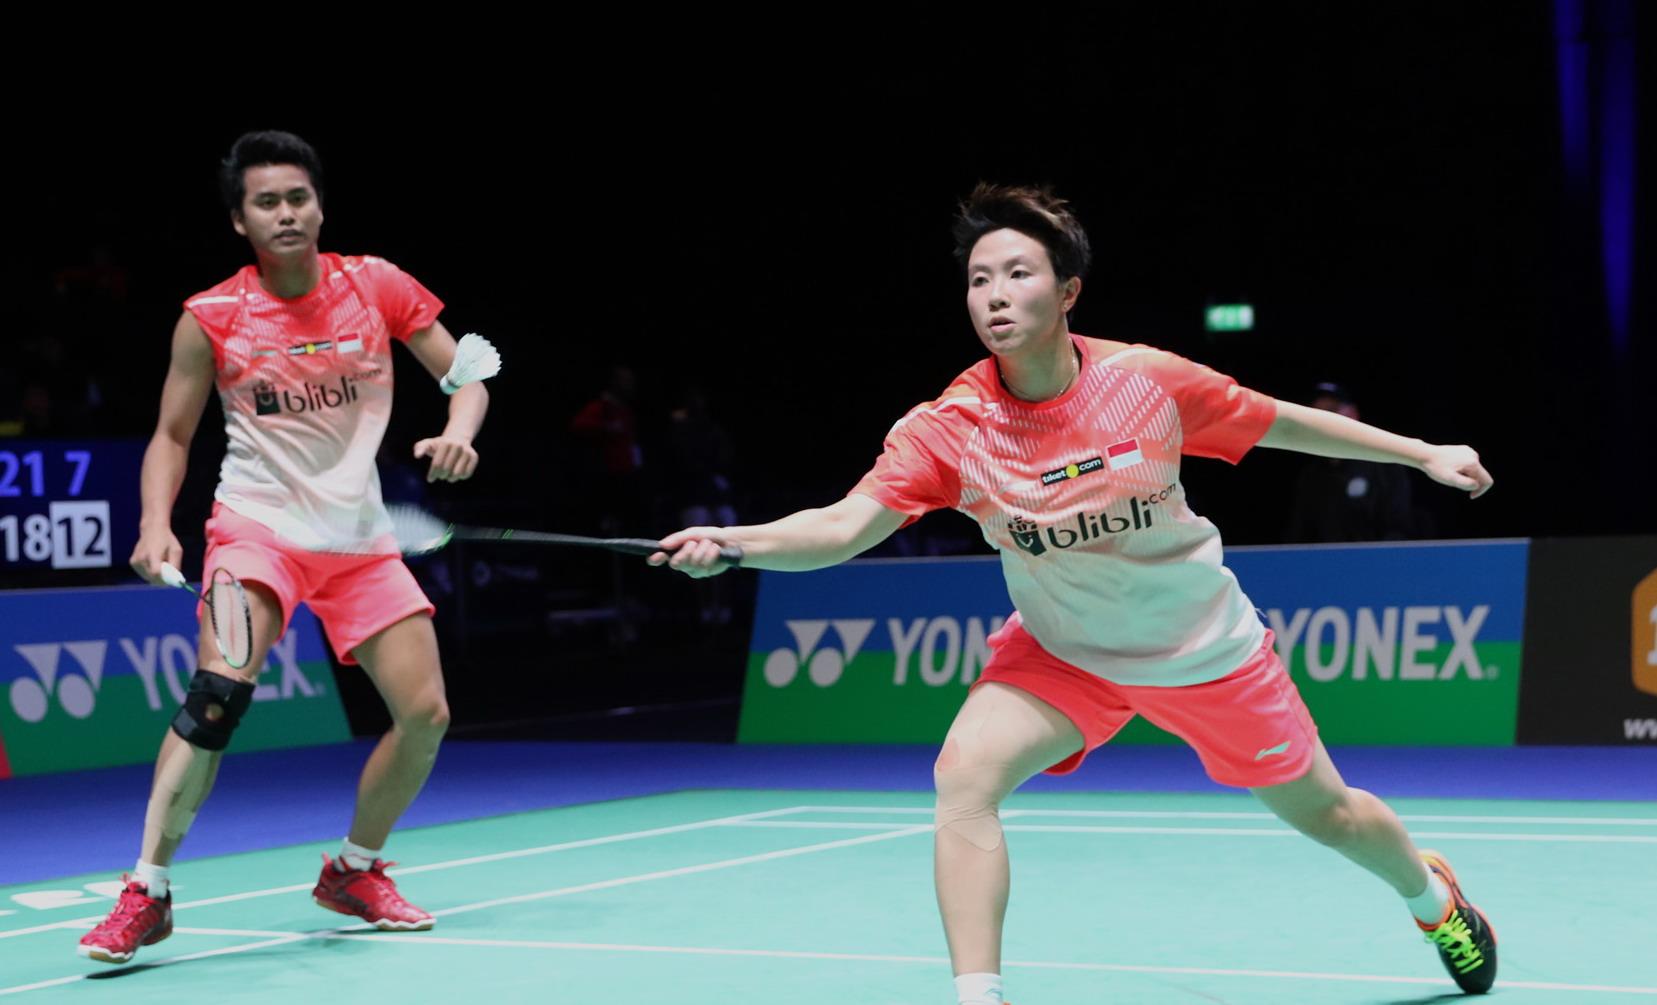 https: img.okeinfo.net content 2019 01 27 40 2010079 takluk-dari-wakil-china-tontowi-liliyana-gagal-juarai-indonesia-masters-2019-Tqh8rhtLaN.jpg